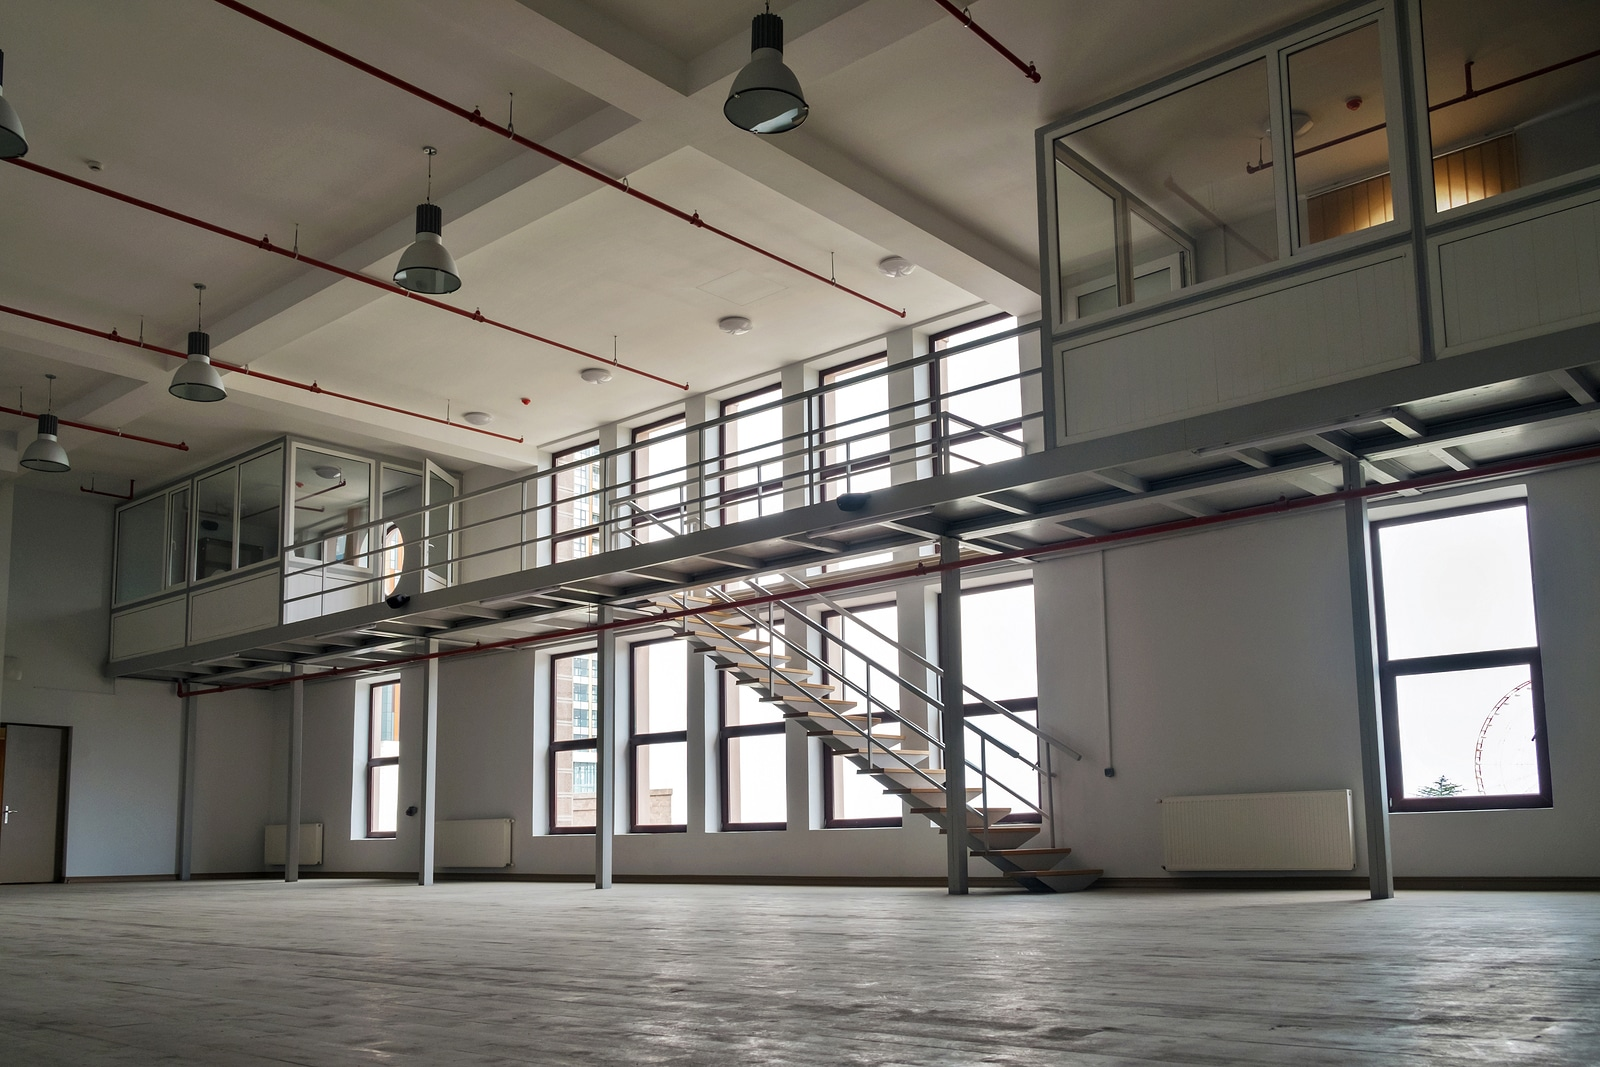 Mezzanine systems and platforms